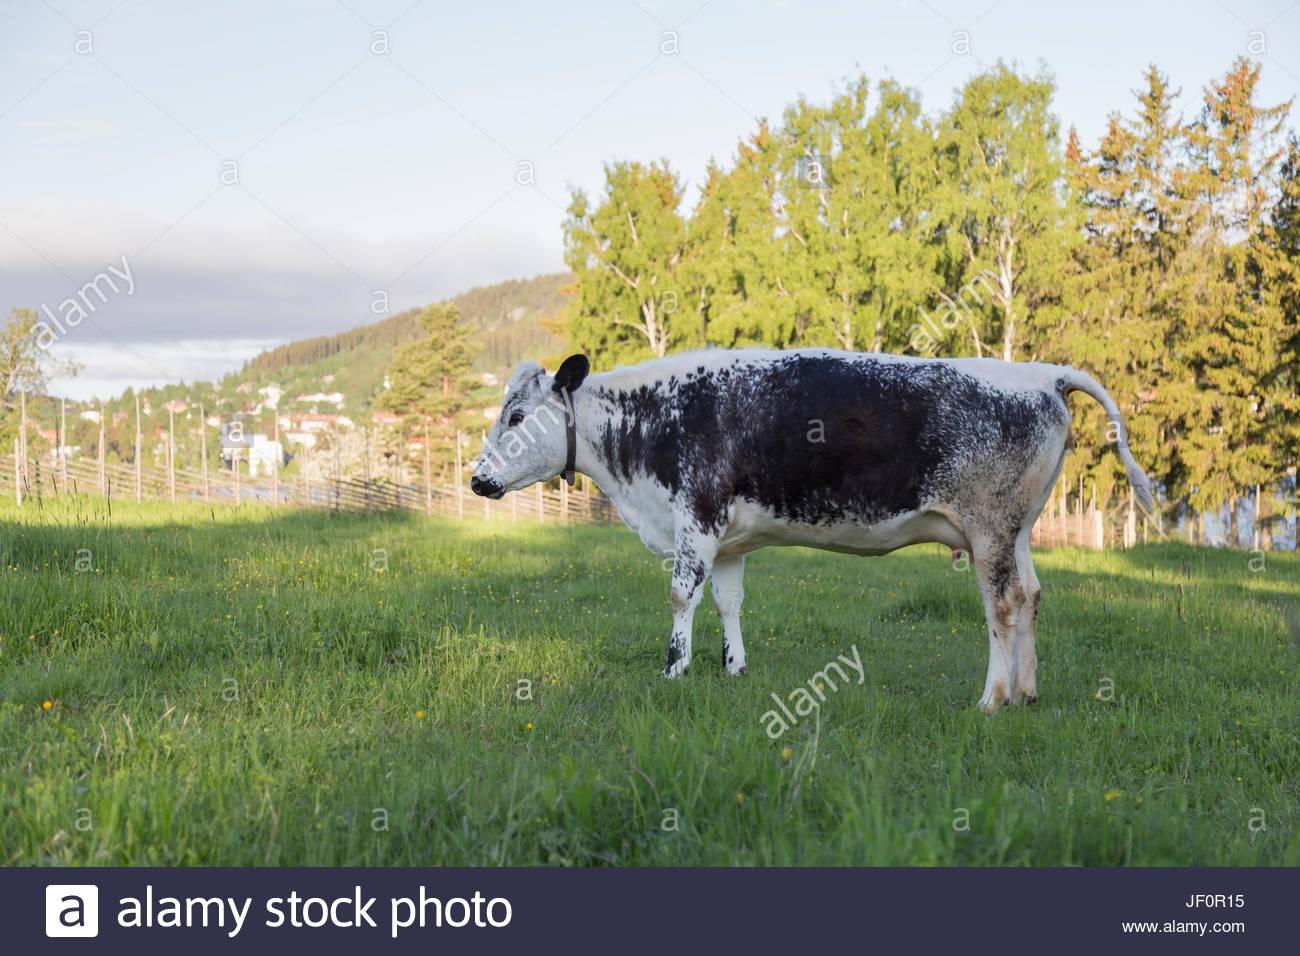 Swedish Mountain Breed on pasture - Stock Image